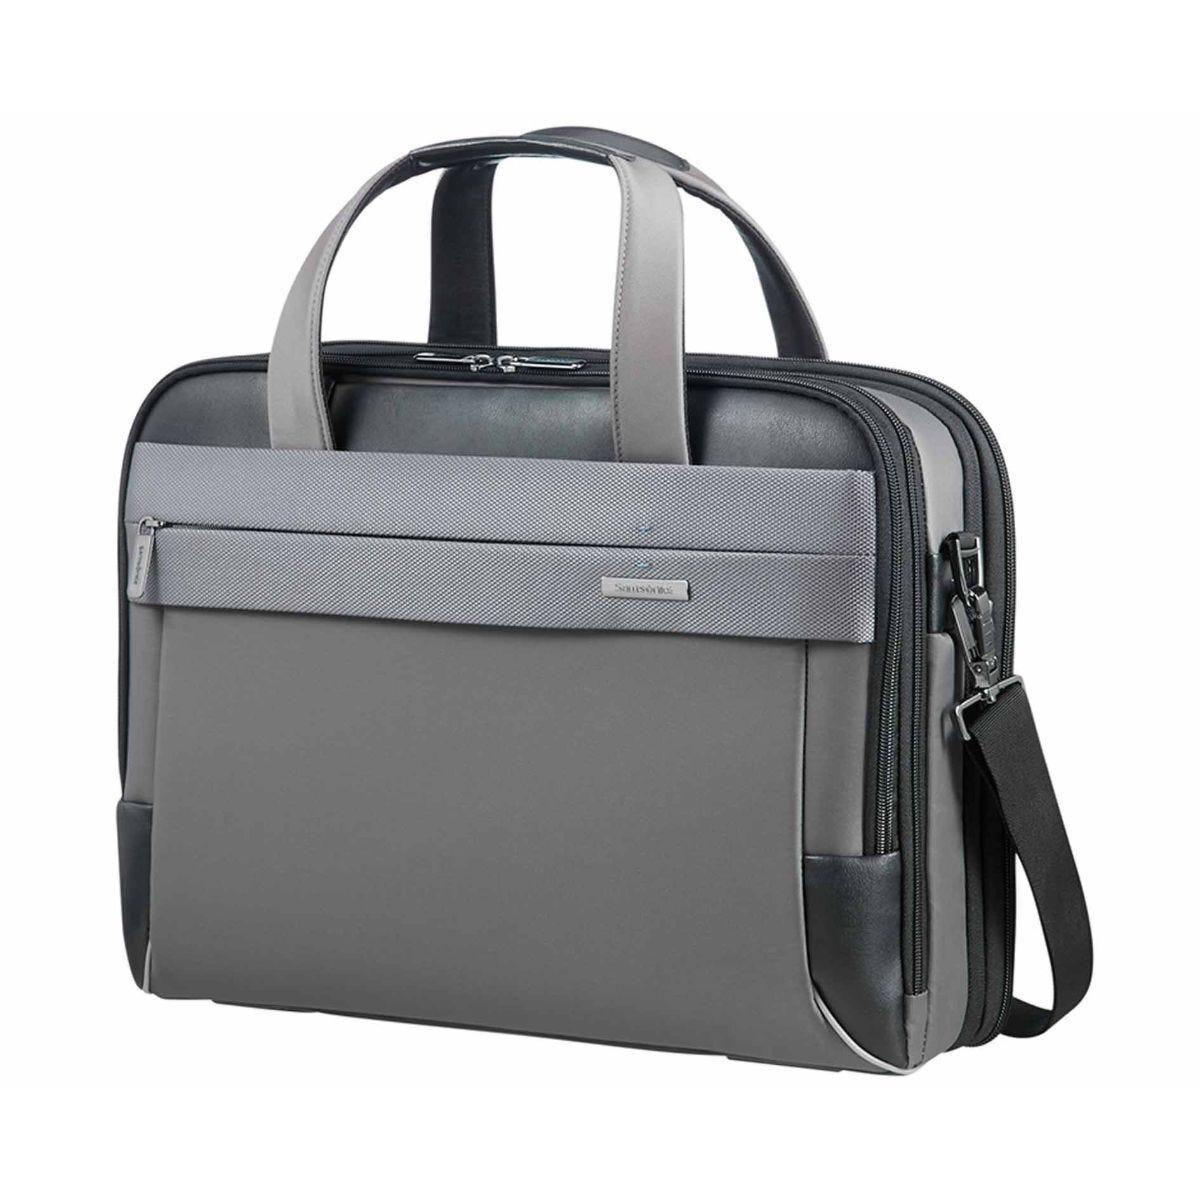 Samsonite Spectrolite Laptop Bag 15.6 Inch Grey